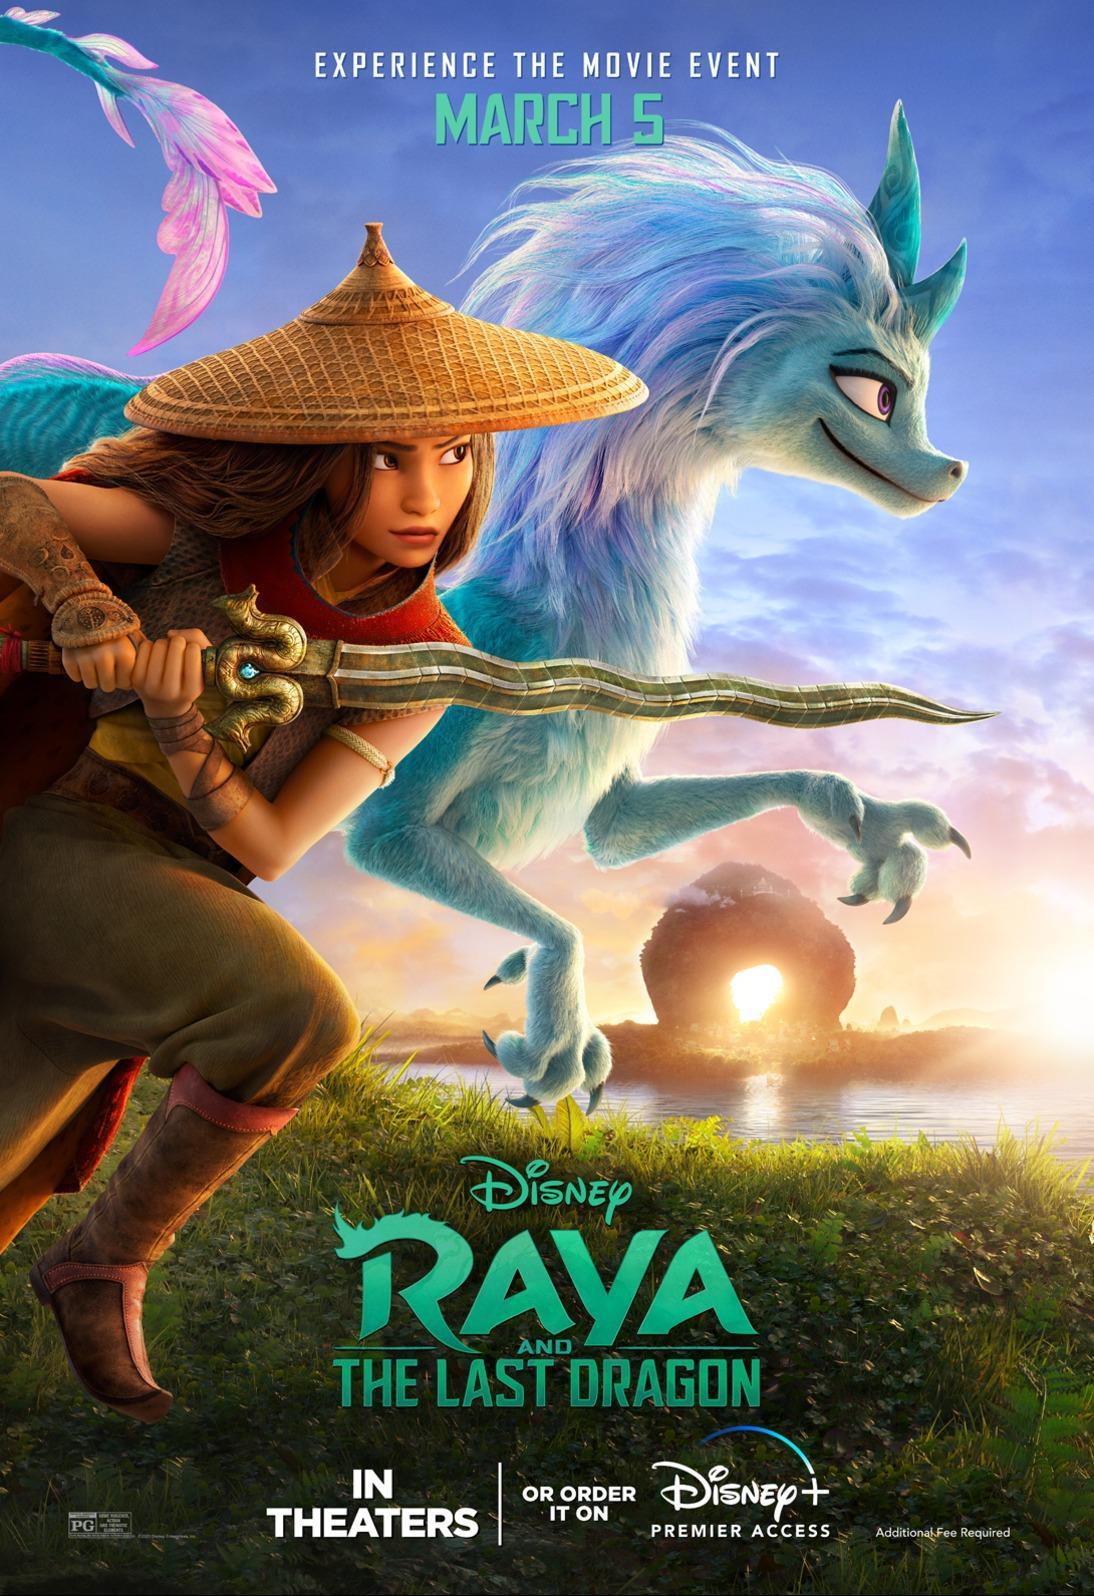 'Raya and the Last Dragon' poster